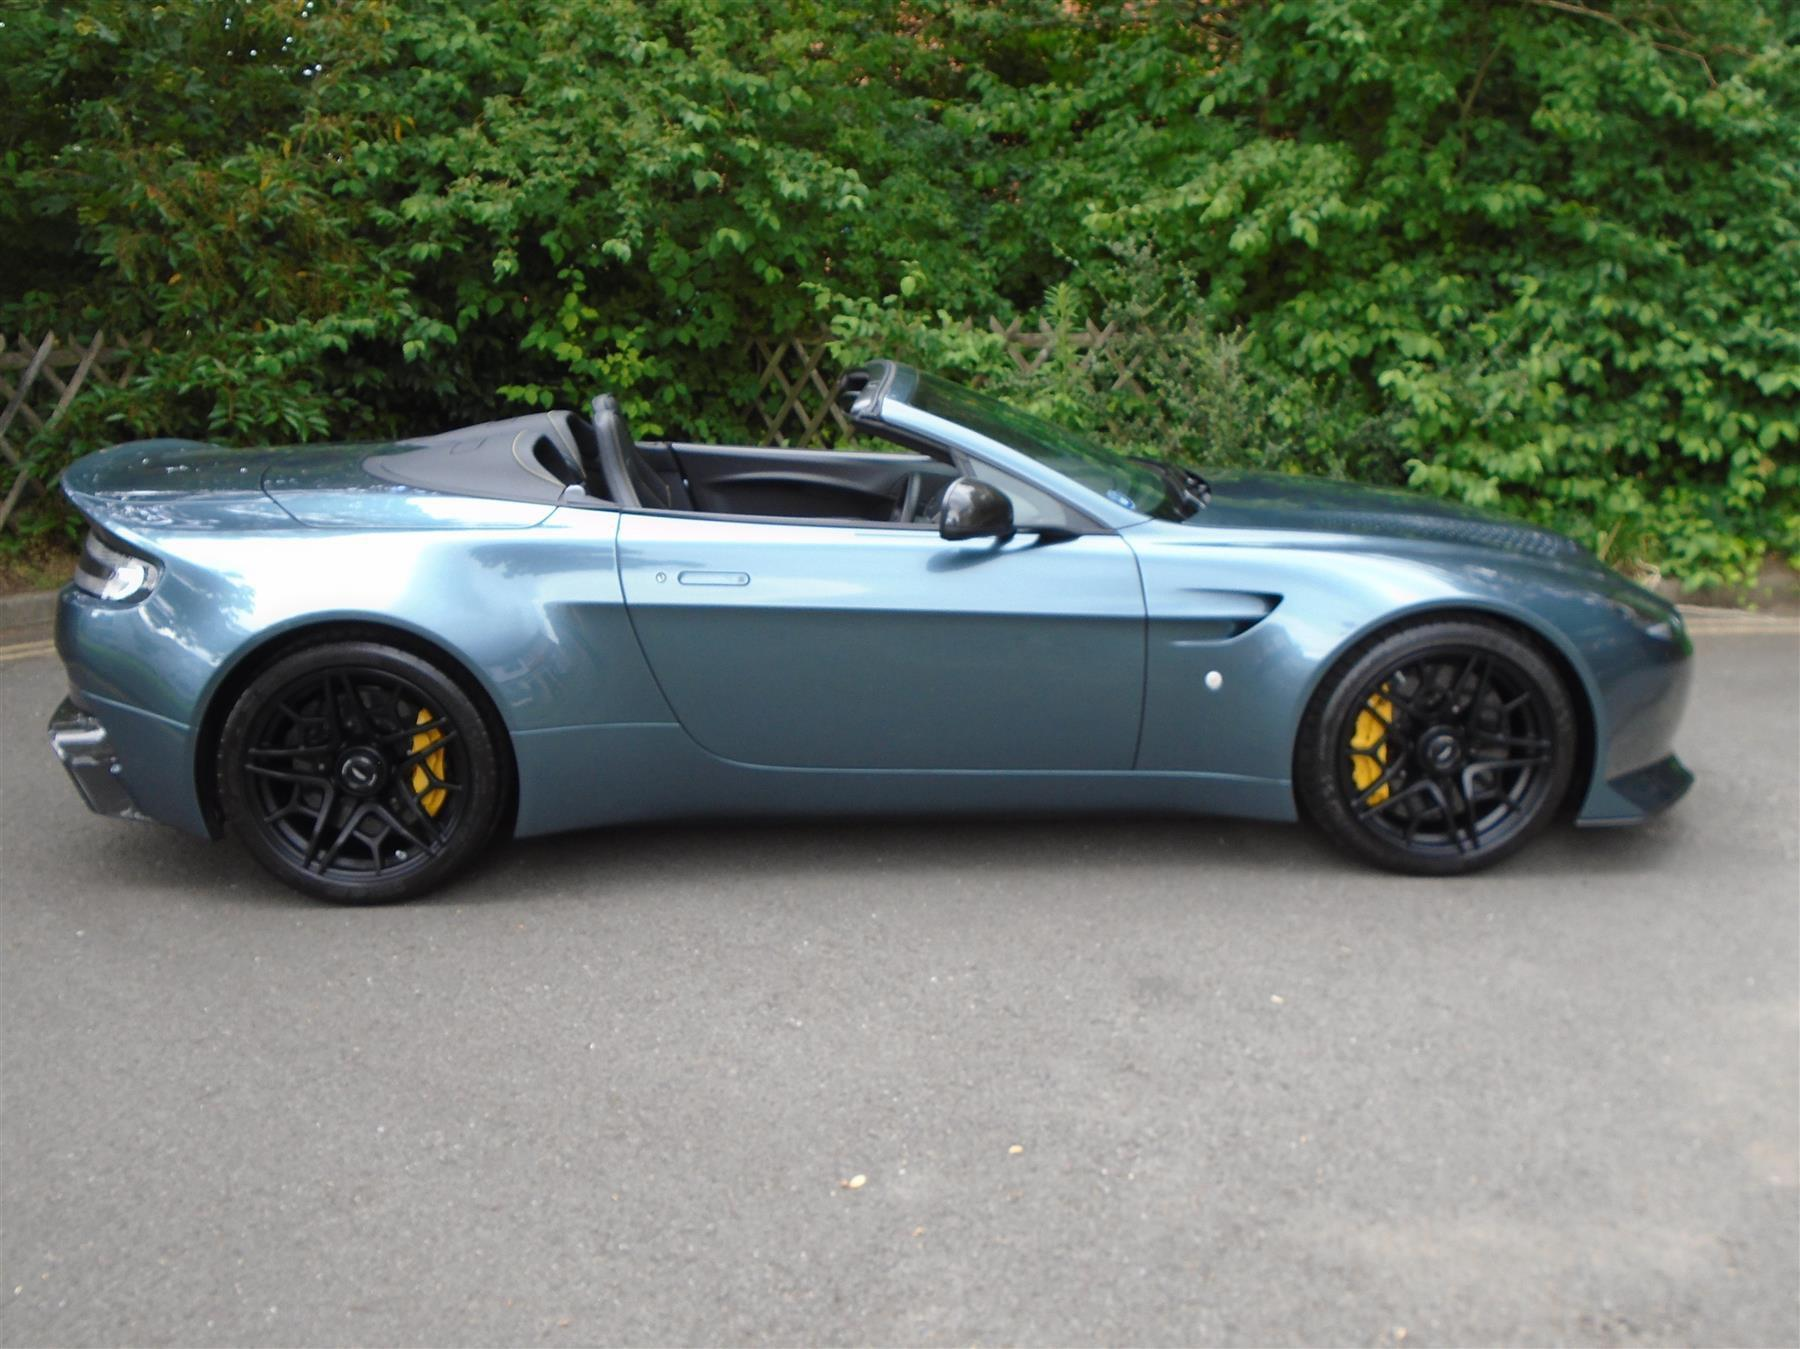 Aston_Martin_V12_Vantage_V600_Roadster_sale-0009